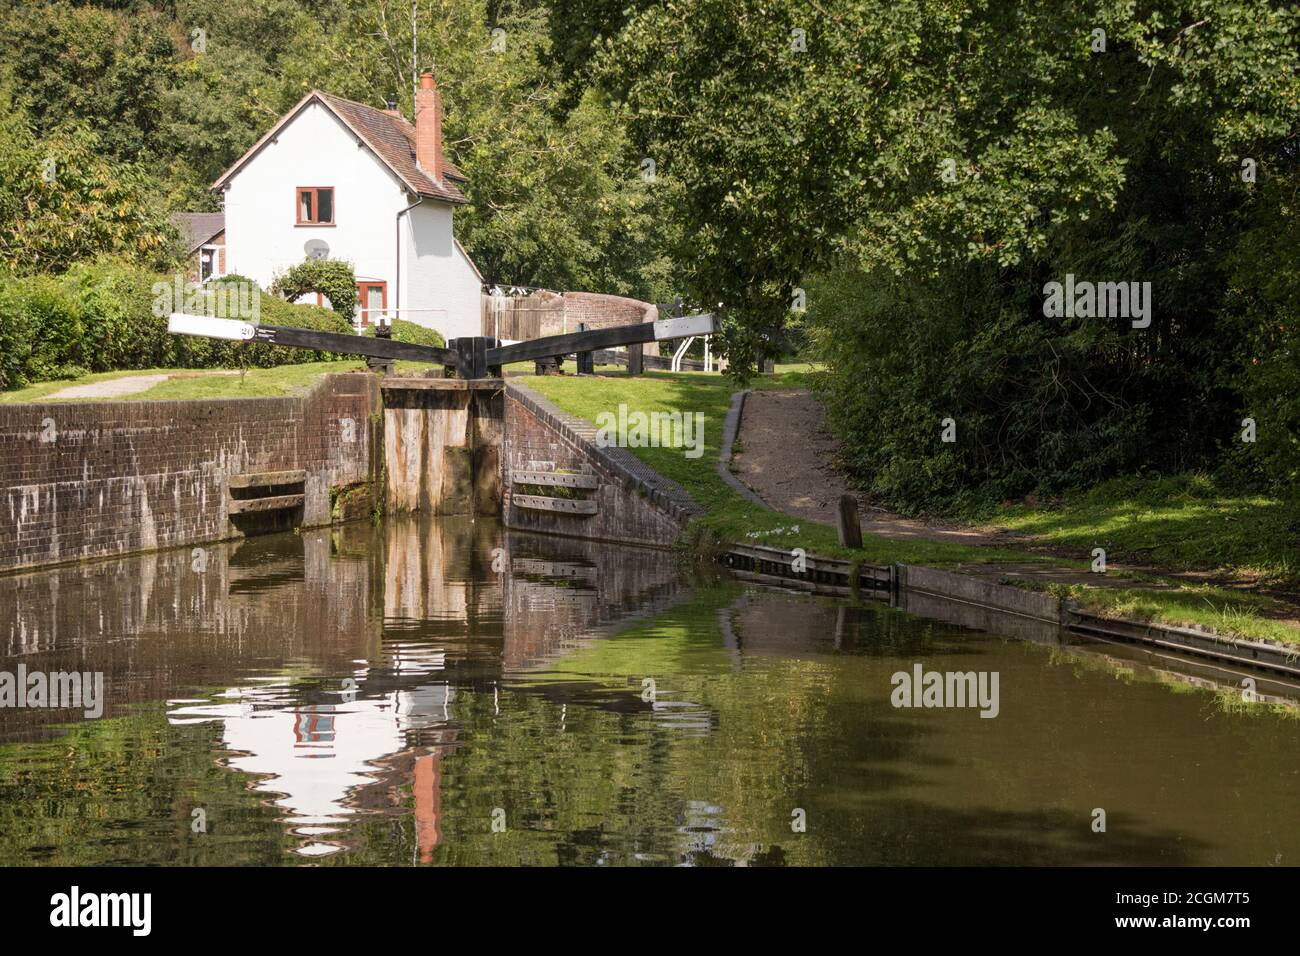 Stratford Upon Avon Canal à Kingwood Junction, Lapworth, Warwickshire, England, UK Banque D'Images